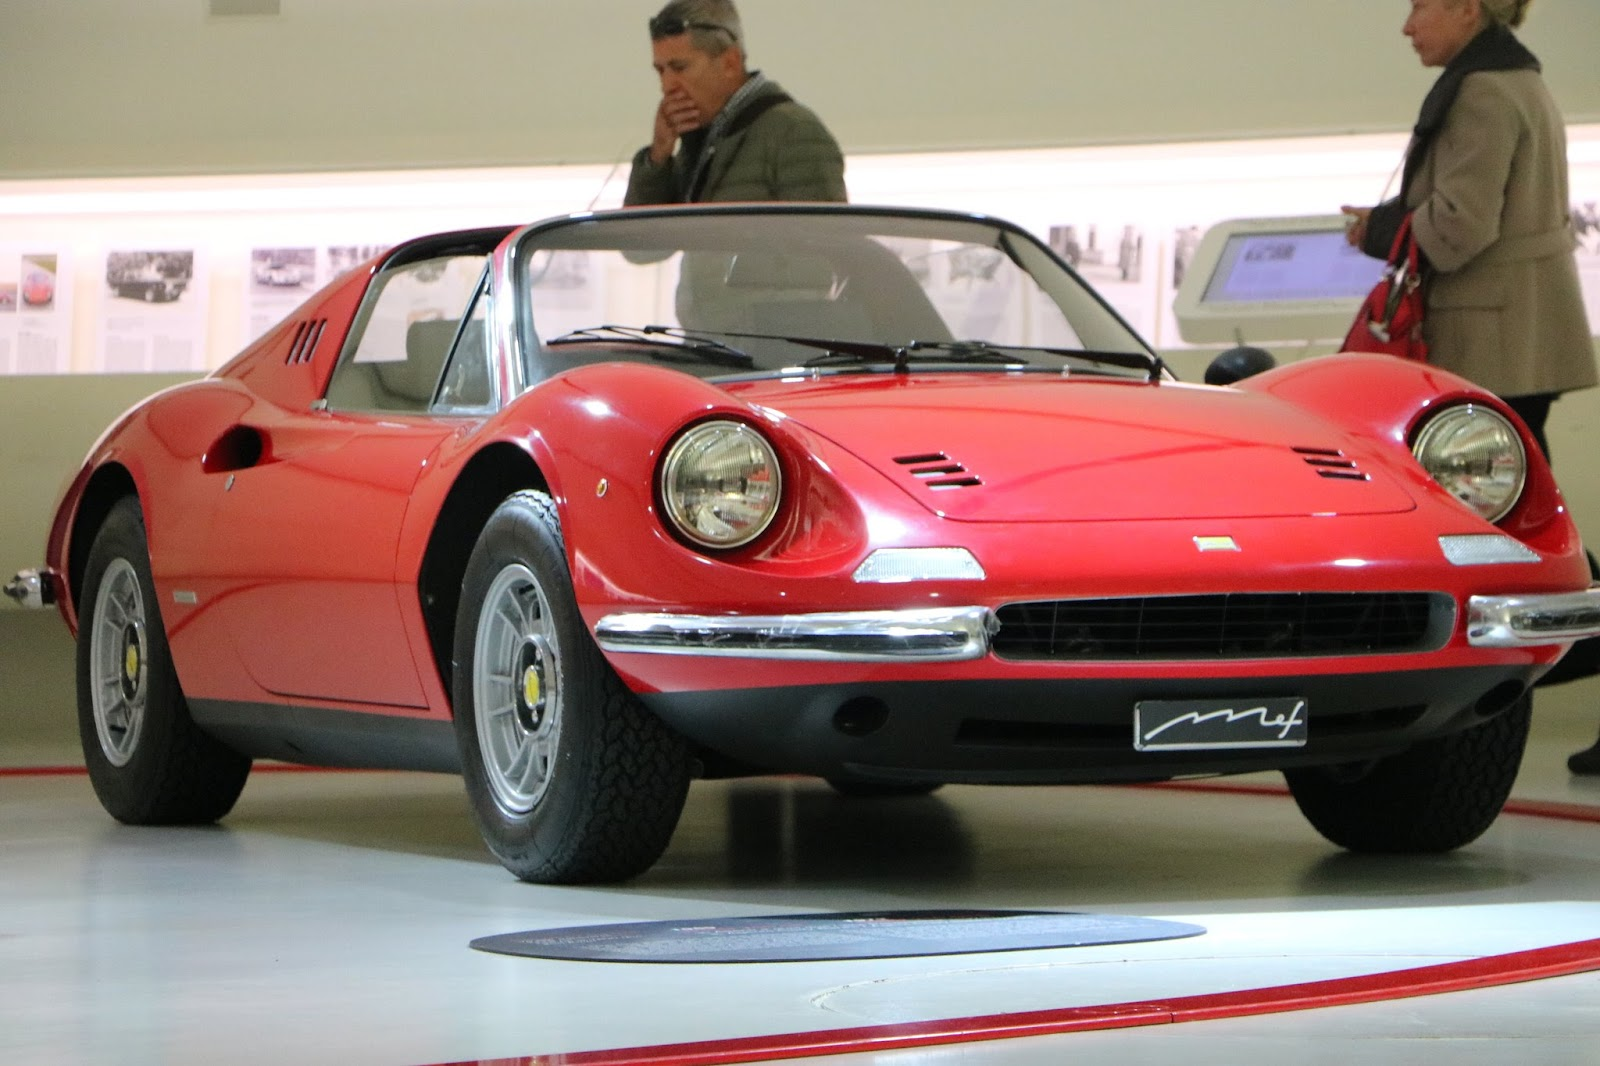 Modena - Enzo Museum 0072 - 1969 Dino 246 GT.jpg